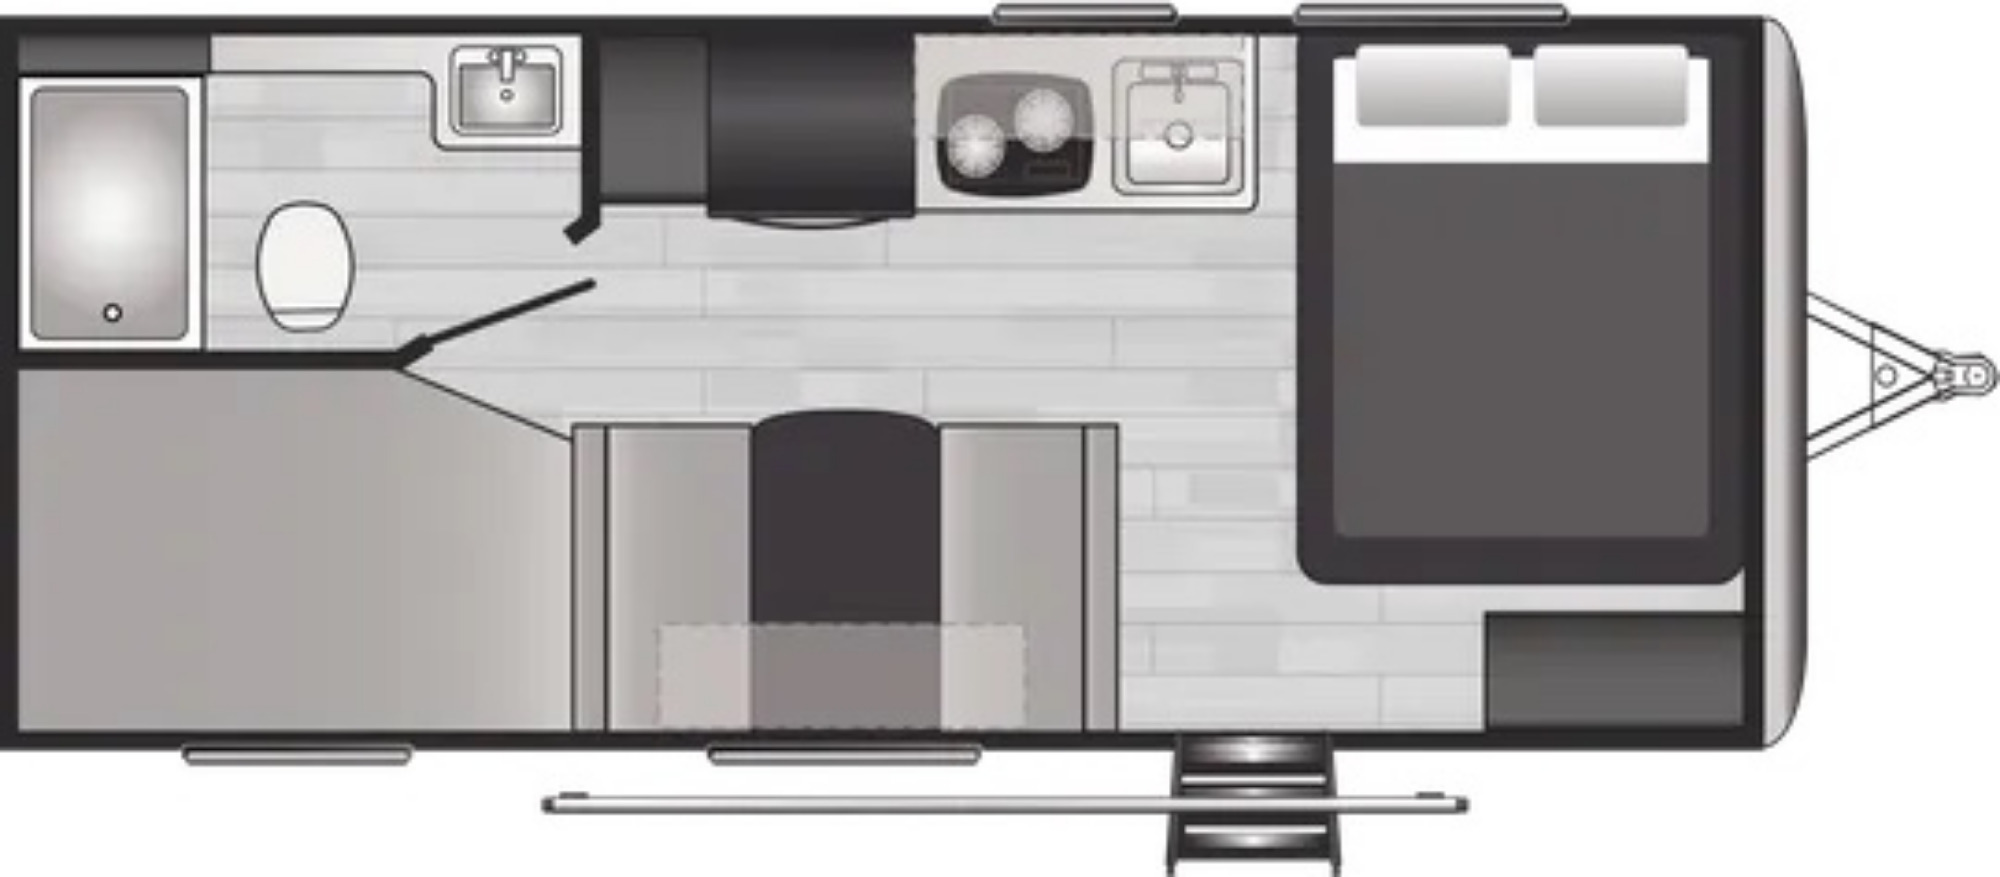 View Floor Plan for 2021 KEYSTONE SPRINGDALE 2010BH